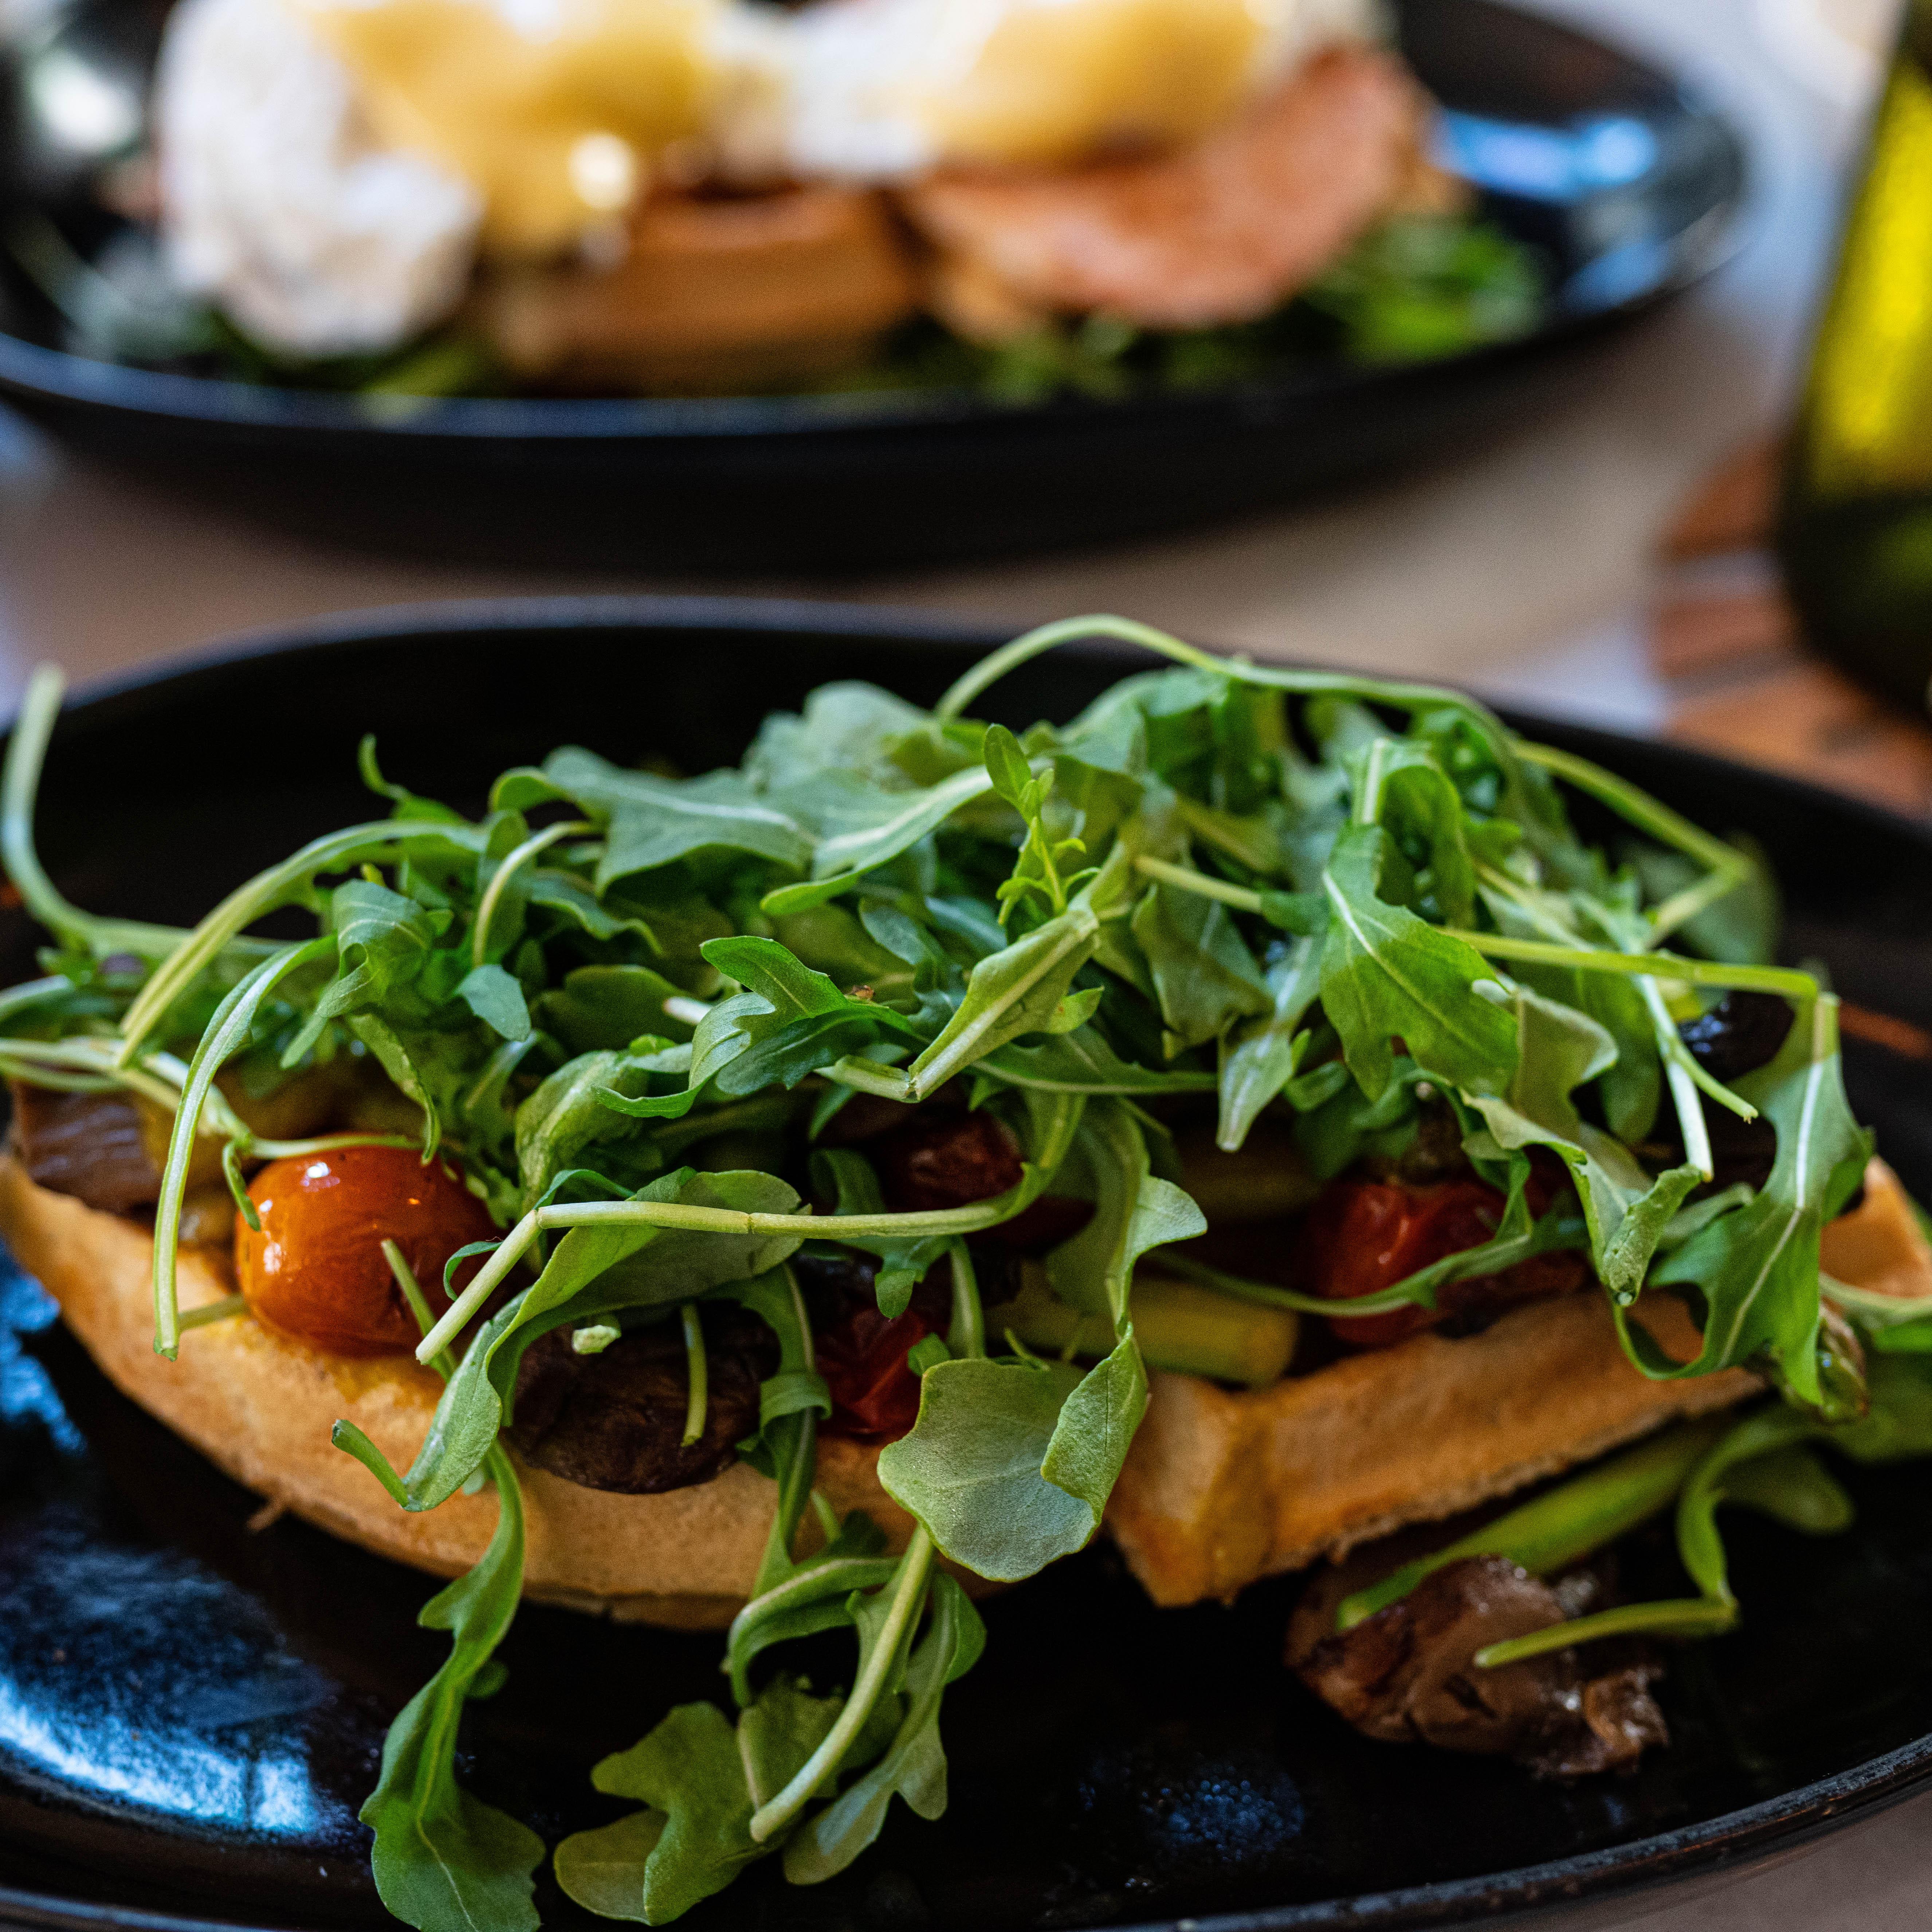 Mahalo Cocina y Jardin - Vegan Waffle Florentine